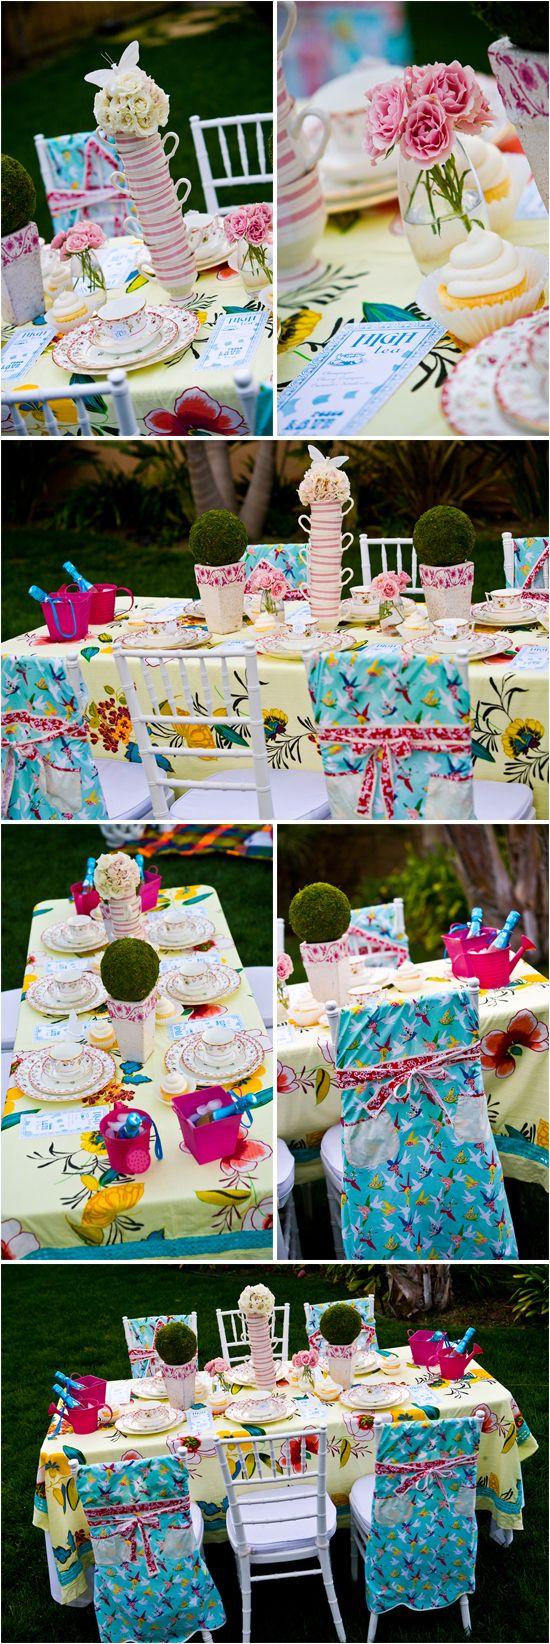 Alice in Wonderland themed bridal shower